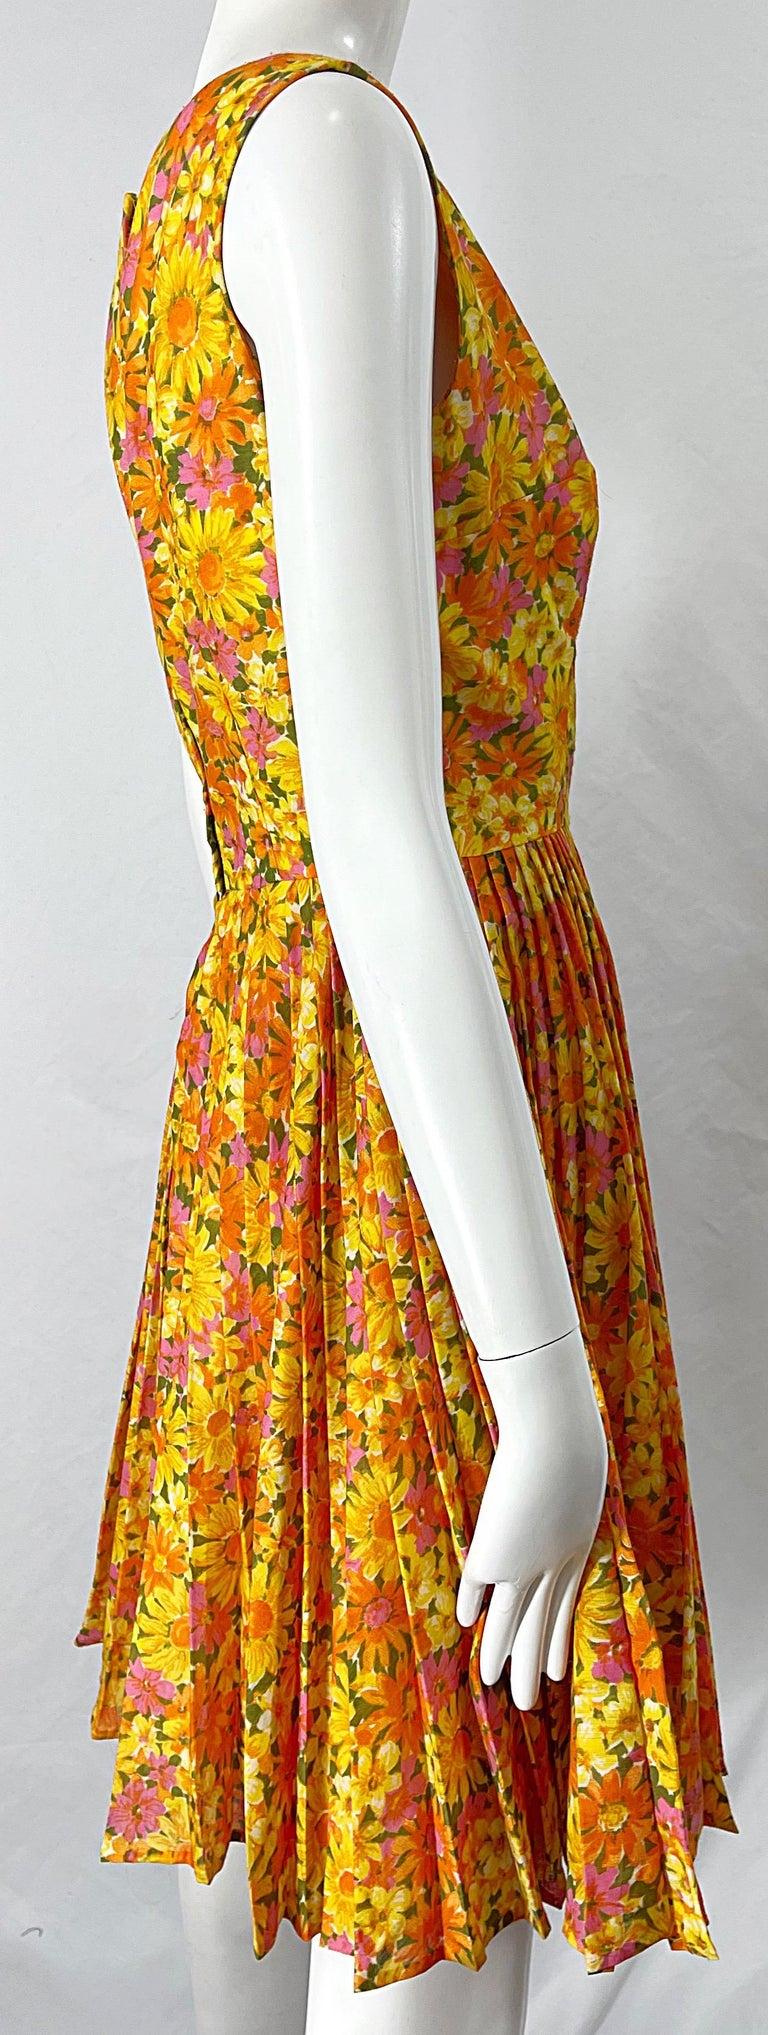 1950s Suzy Perette Yellow Pink Orange Daisy Print Cotton Vintage 50s Dress For Sale 5